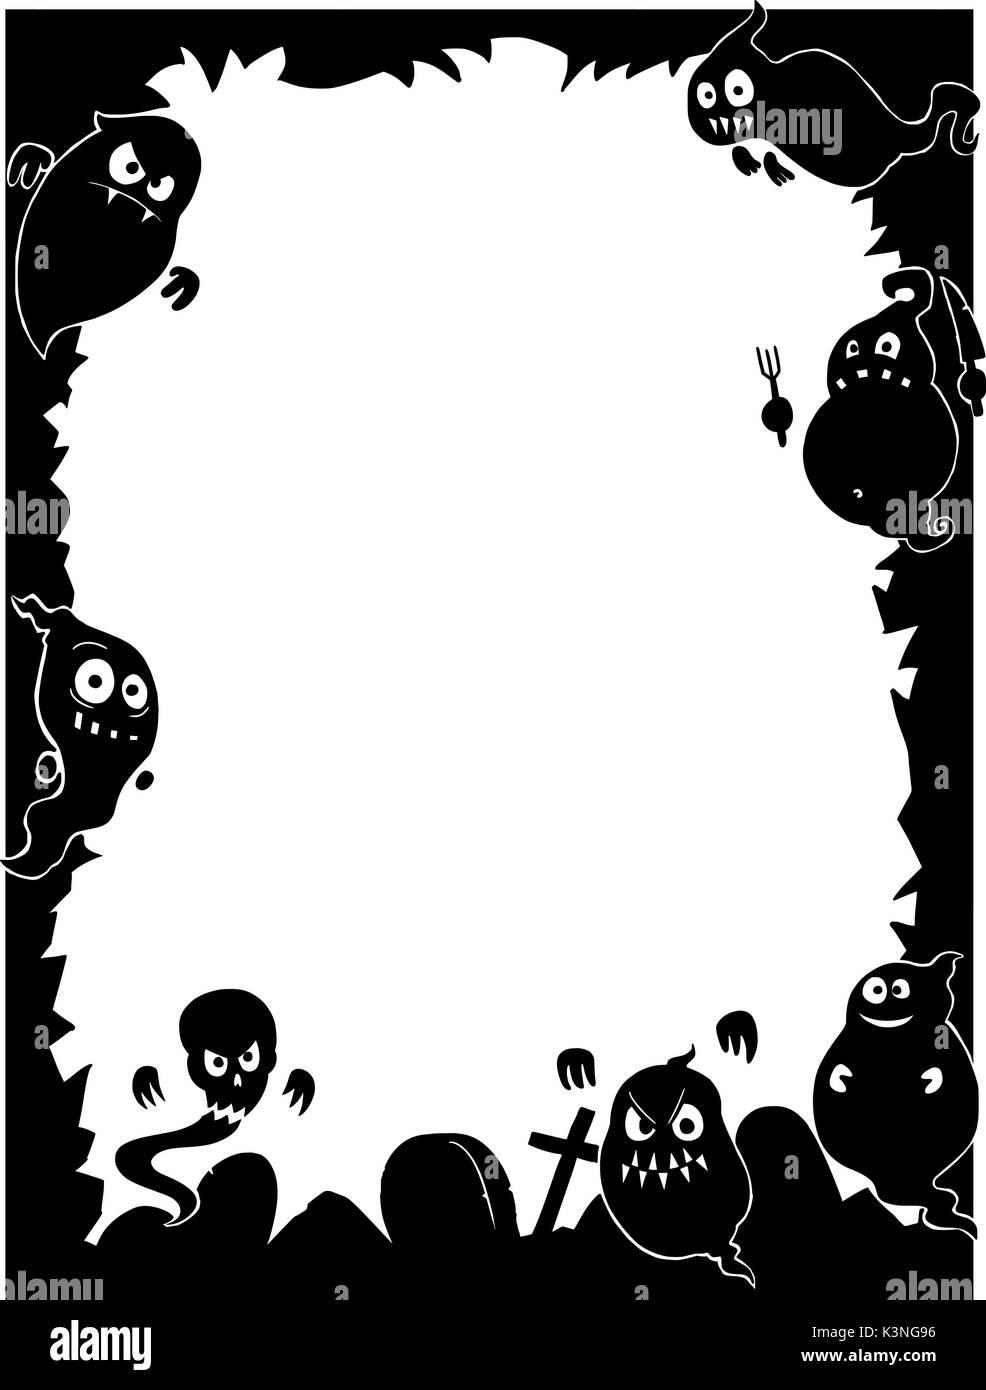 Dessin à La Main Cartoon Halloween Cute Frame Avec Ghost Et